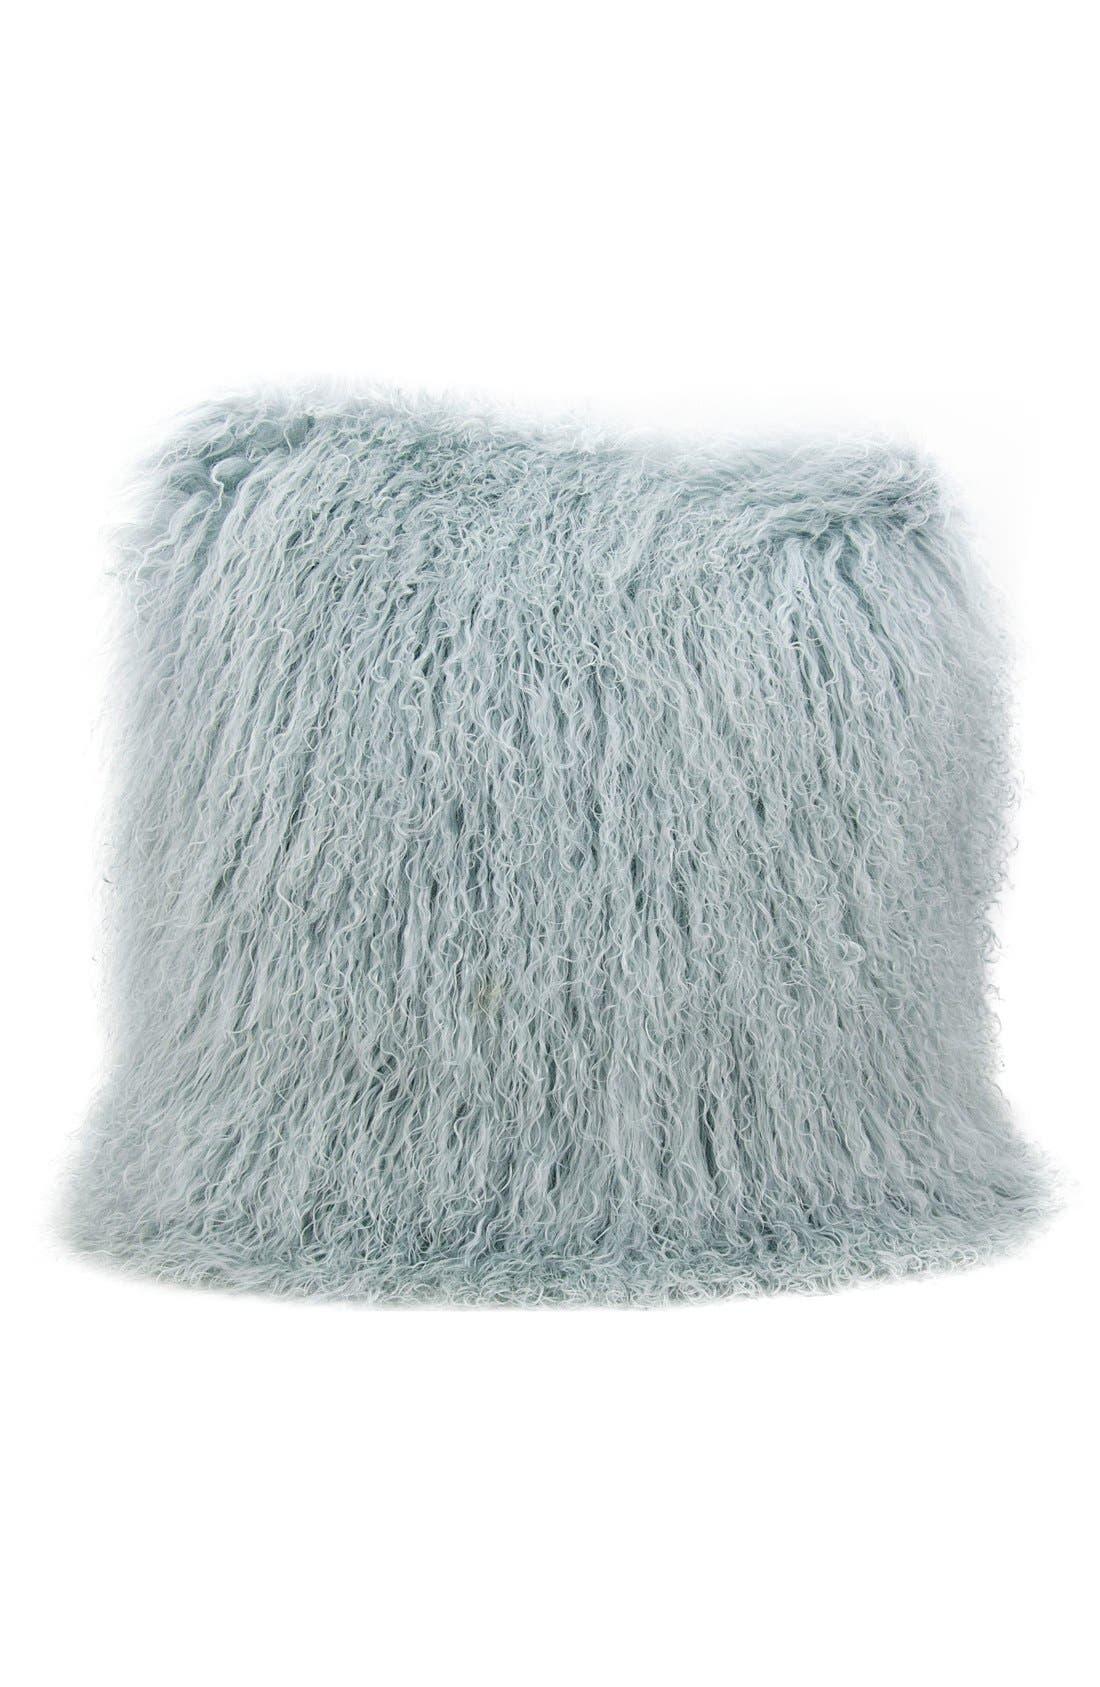 Main Image - Mina Victory Genuine Tibetan Wool Shearling Pillow